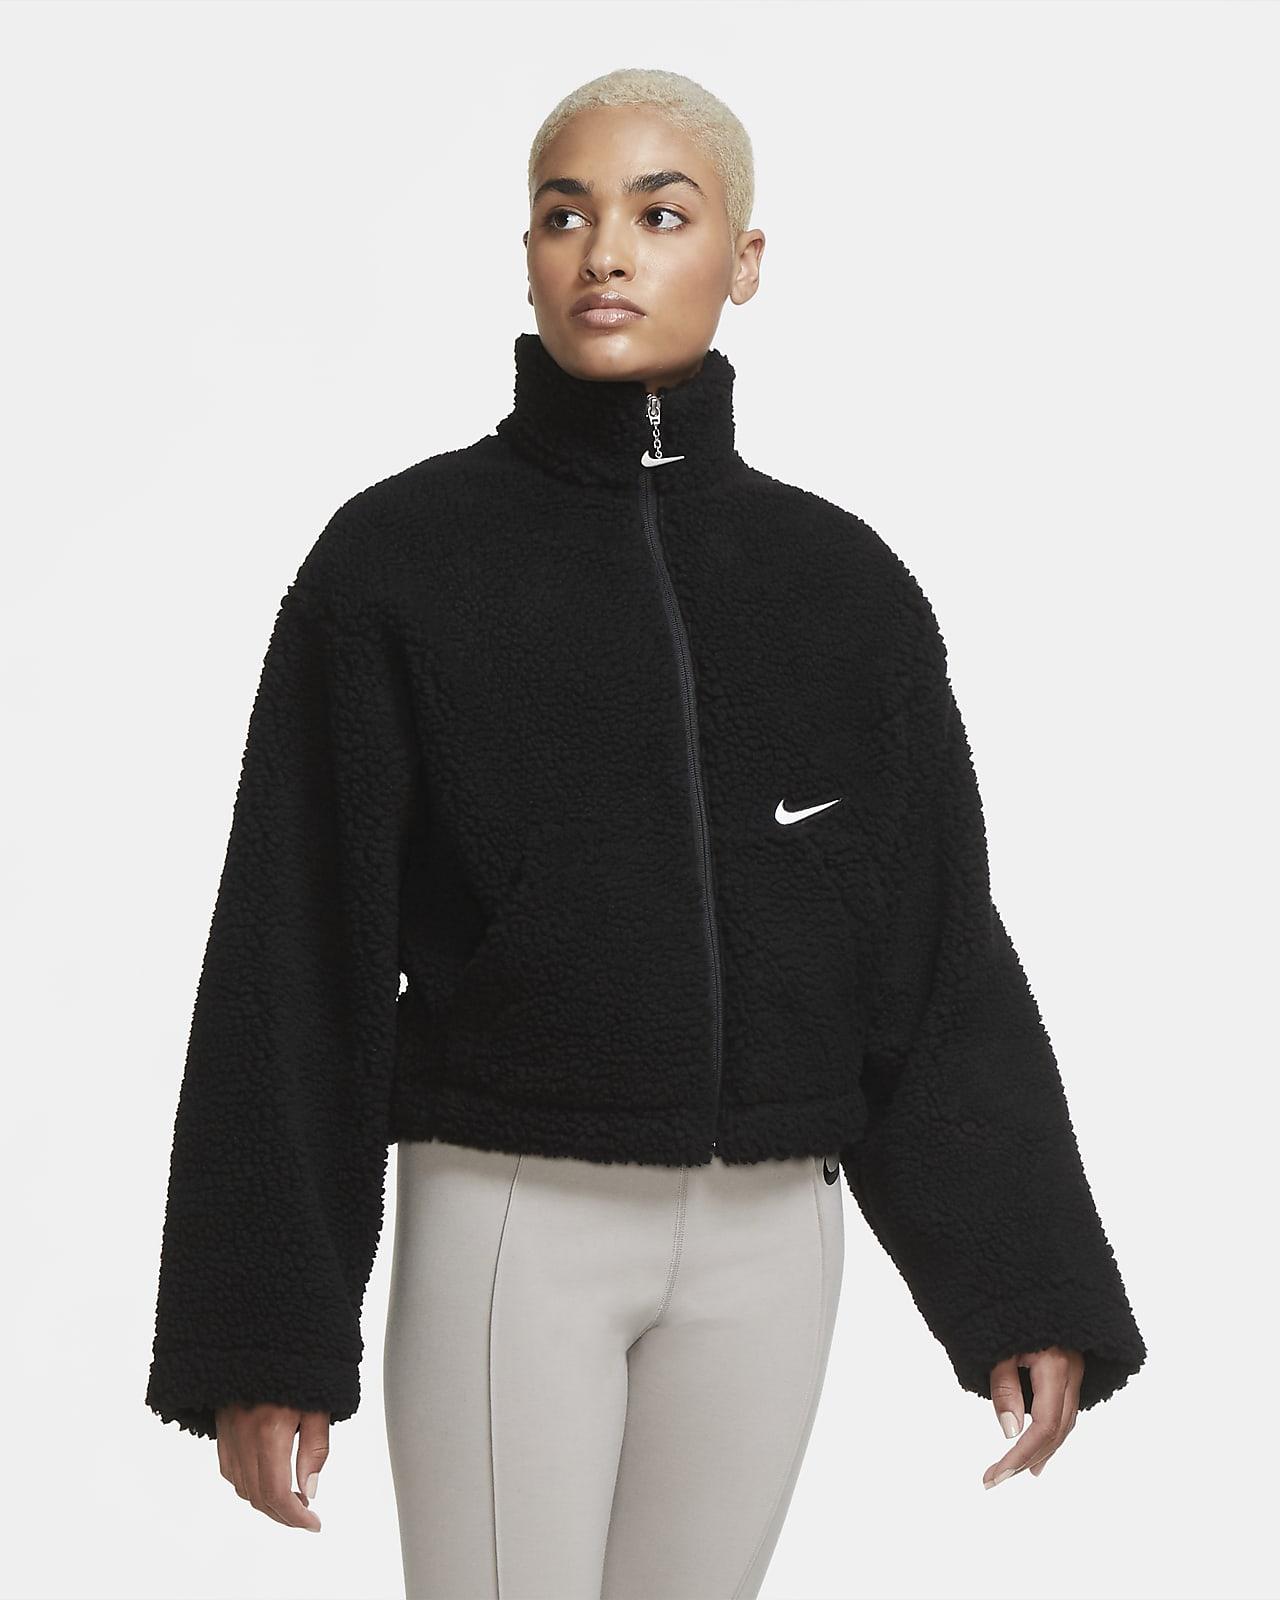 Nike Sportswear Swoosh-jakke til kvinder